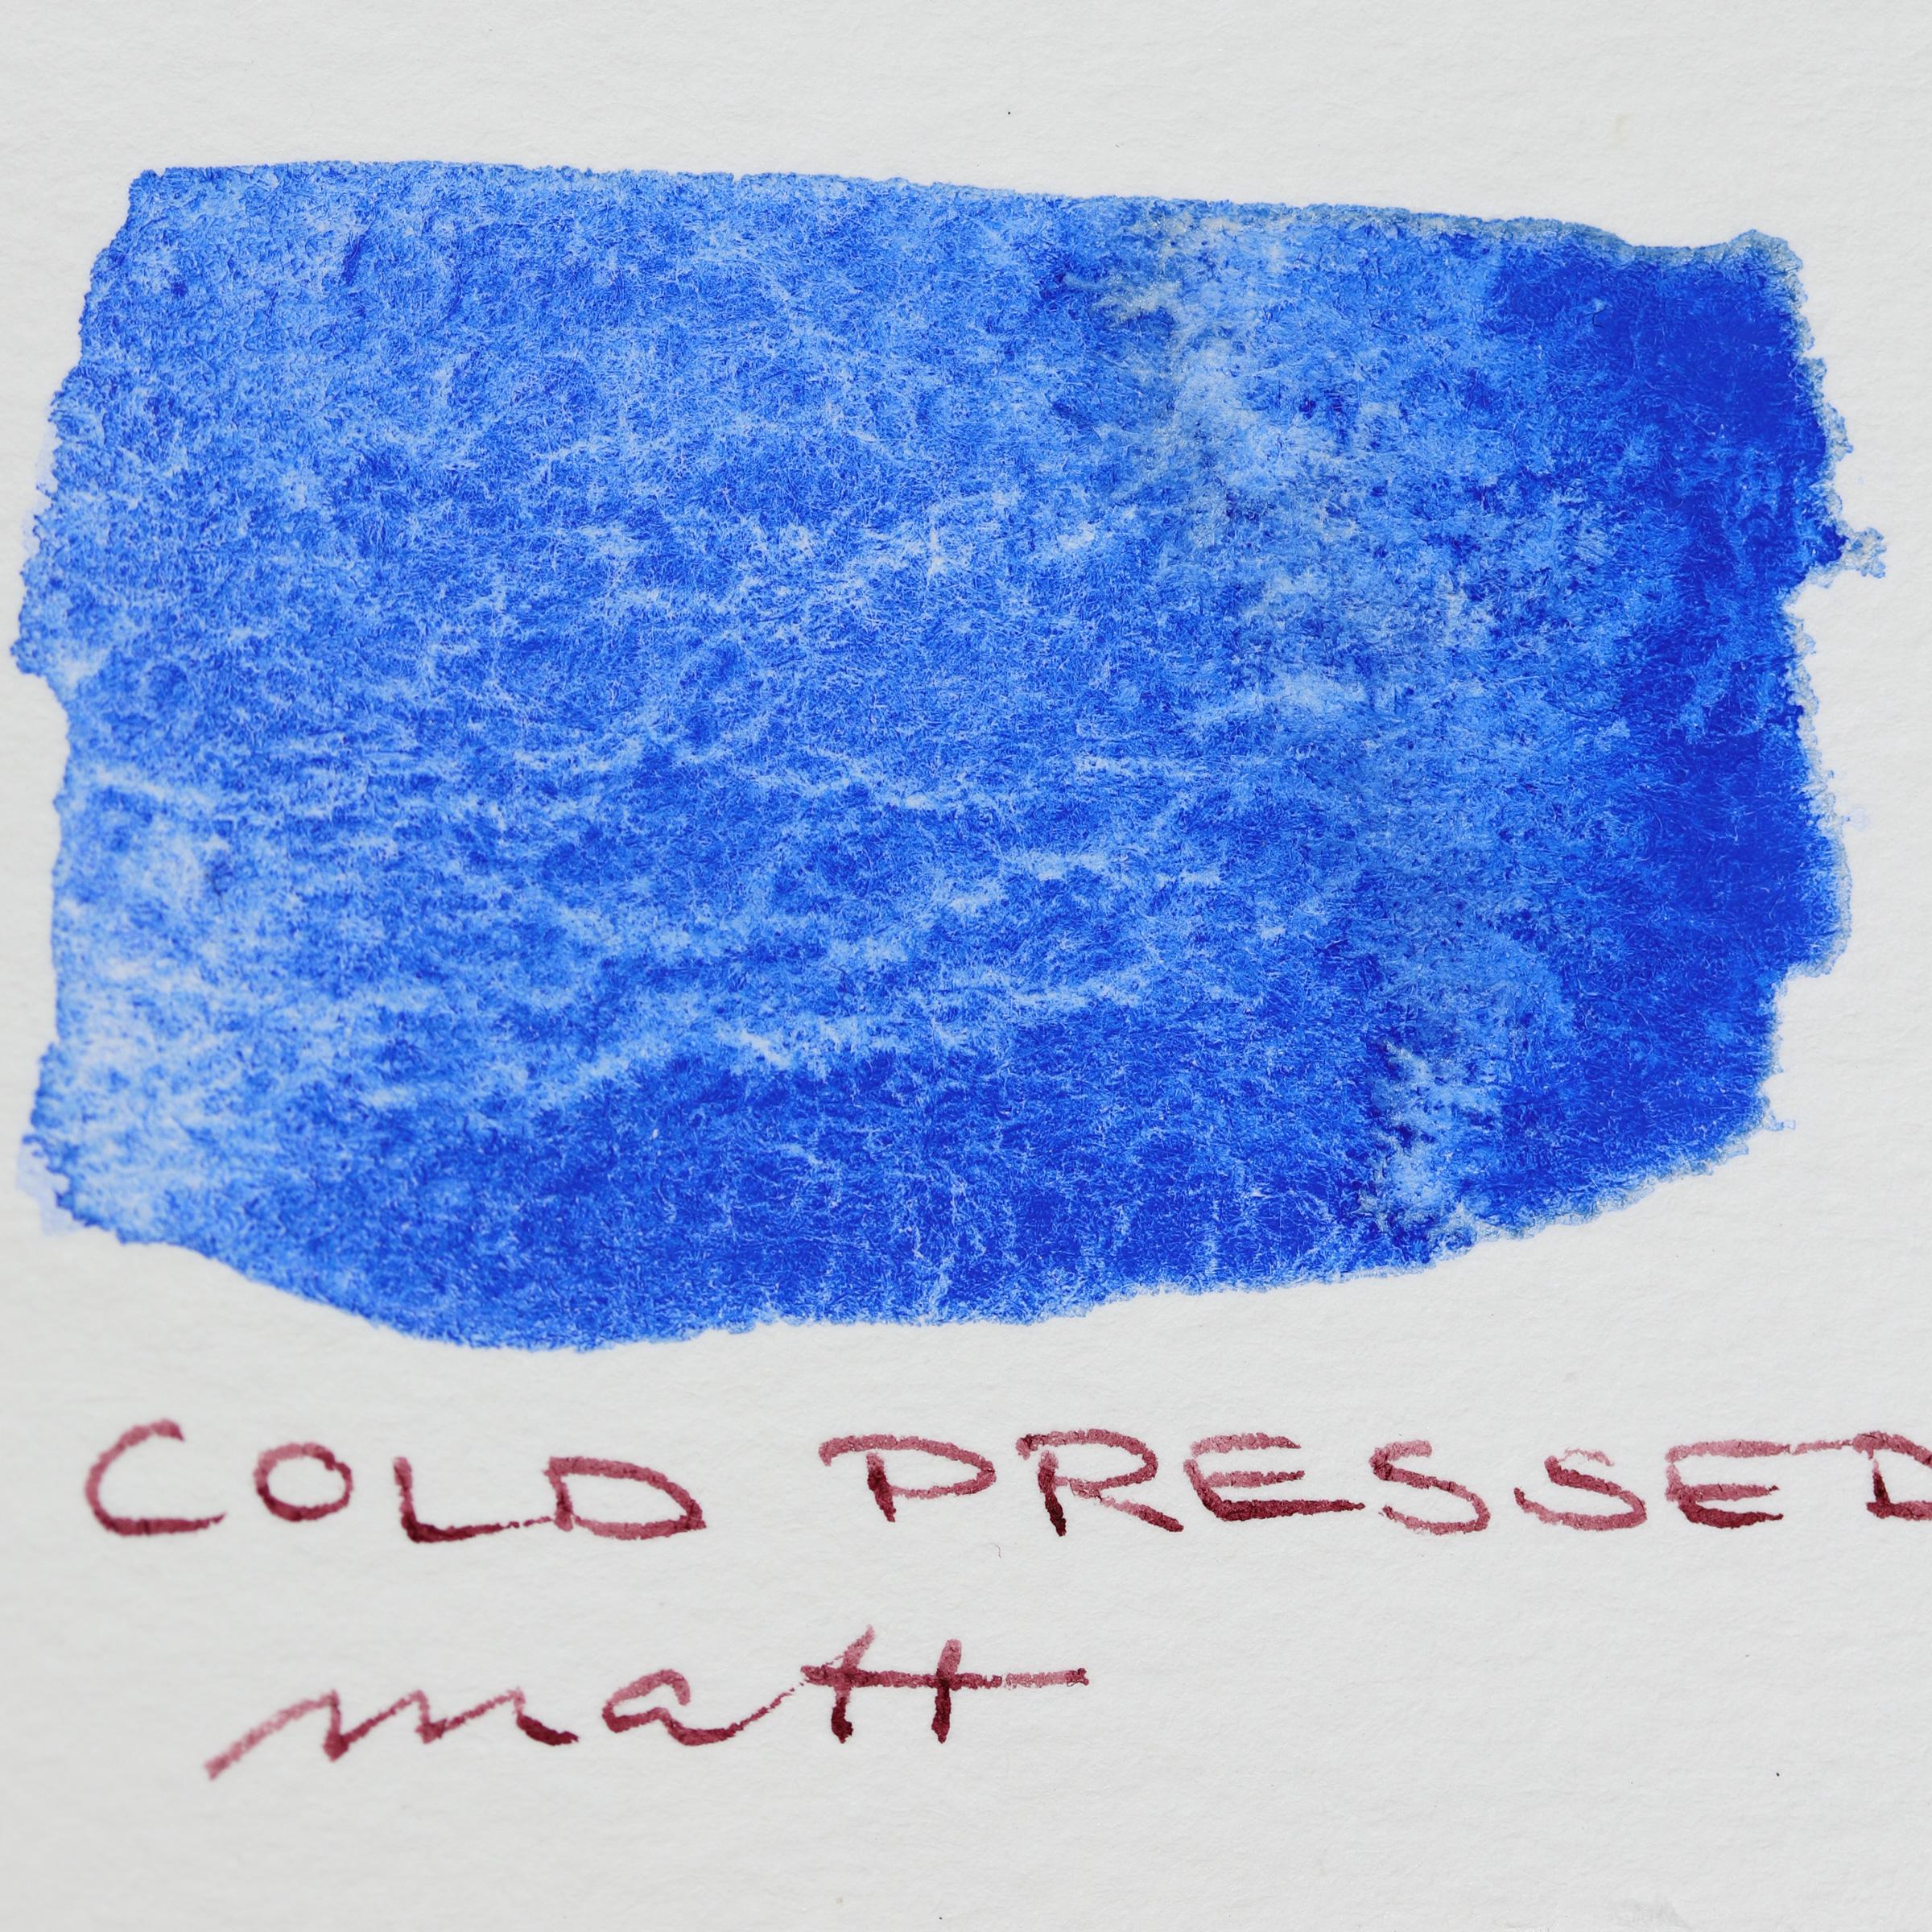 Granulierende Aquarellfarbe – Schmincke Französisch Ultramarin Blau (493) auf Aquarell-Papier, cold pressed, matt.